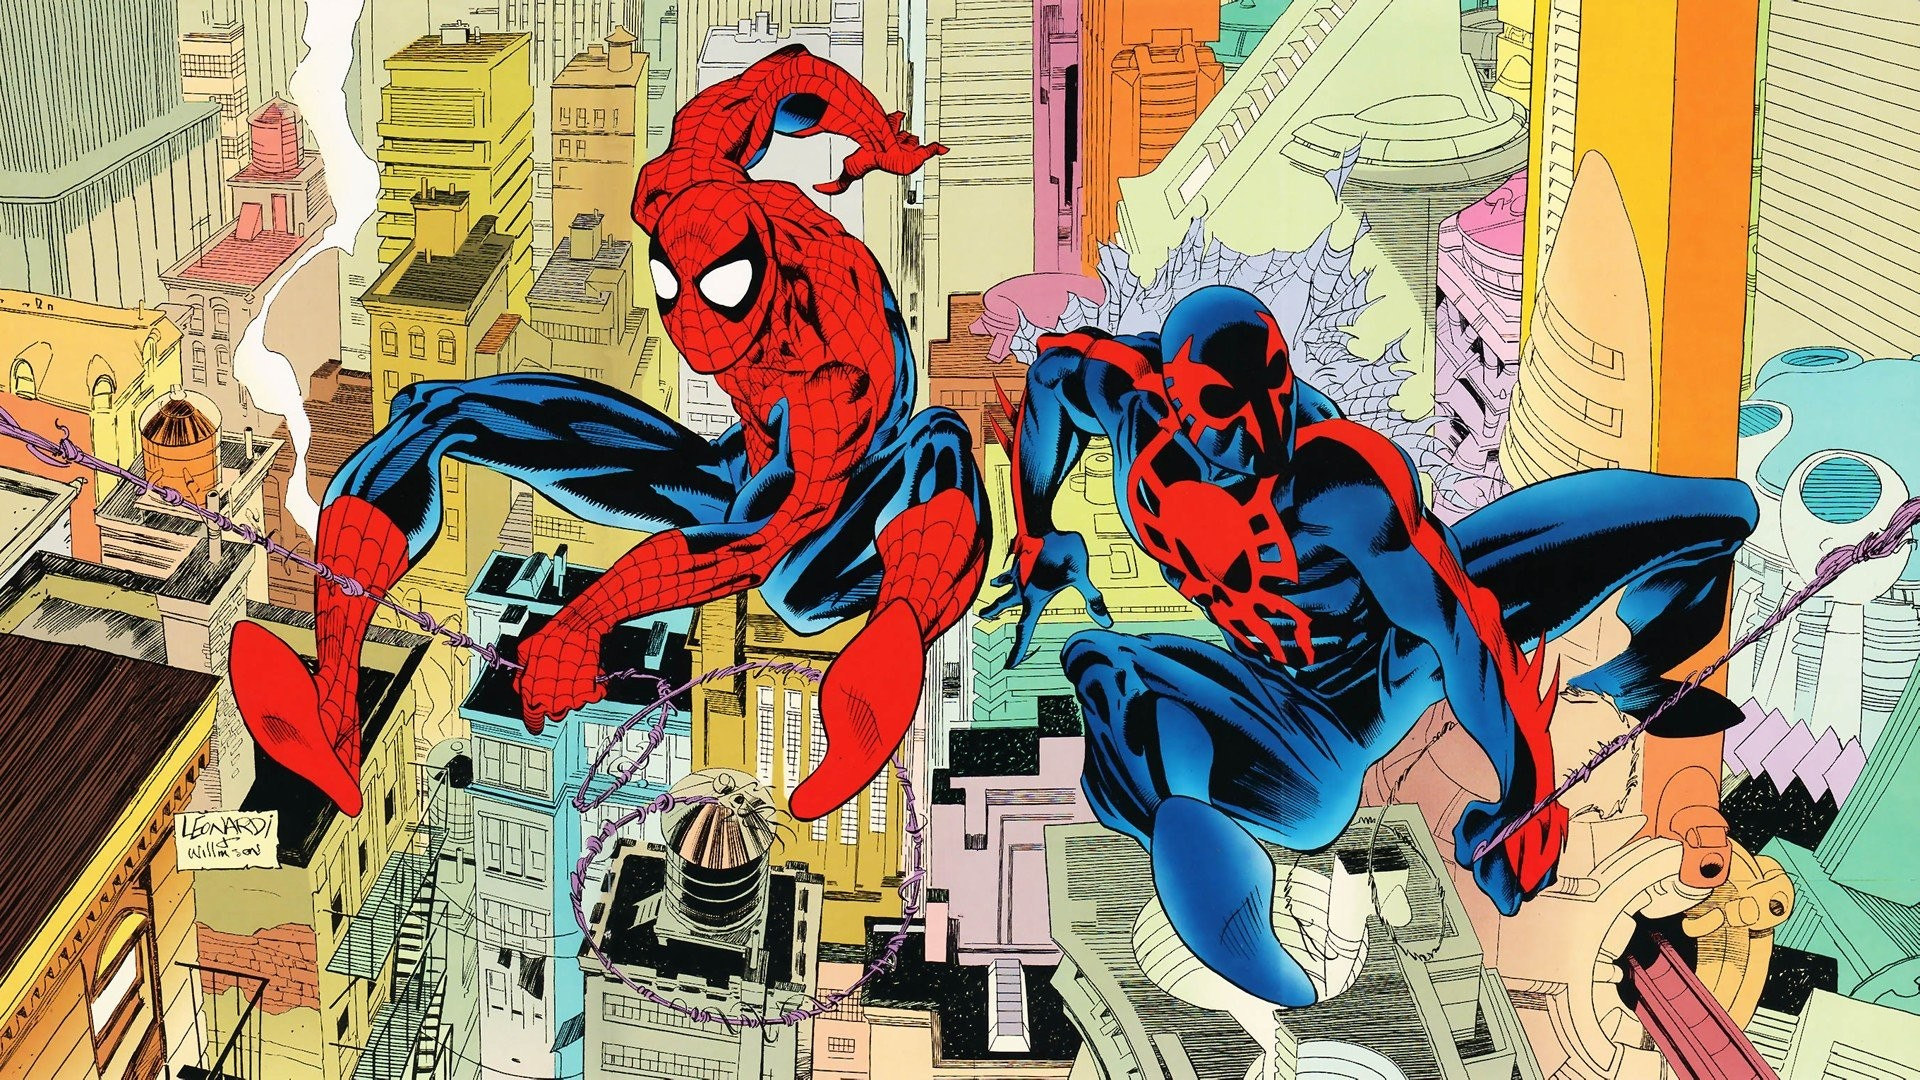 Comics Spider-Man Peter Parker Spider-Man 2099 Miguel O'Hara wallpaper  | | 290734 | WallpaperUP